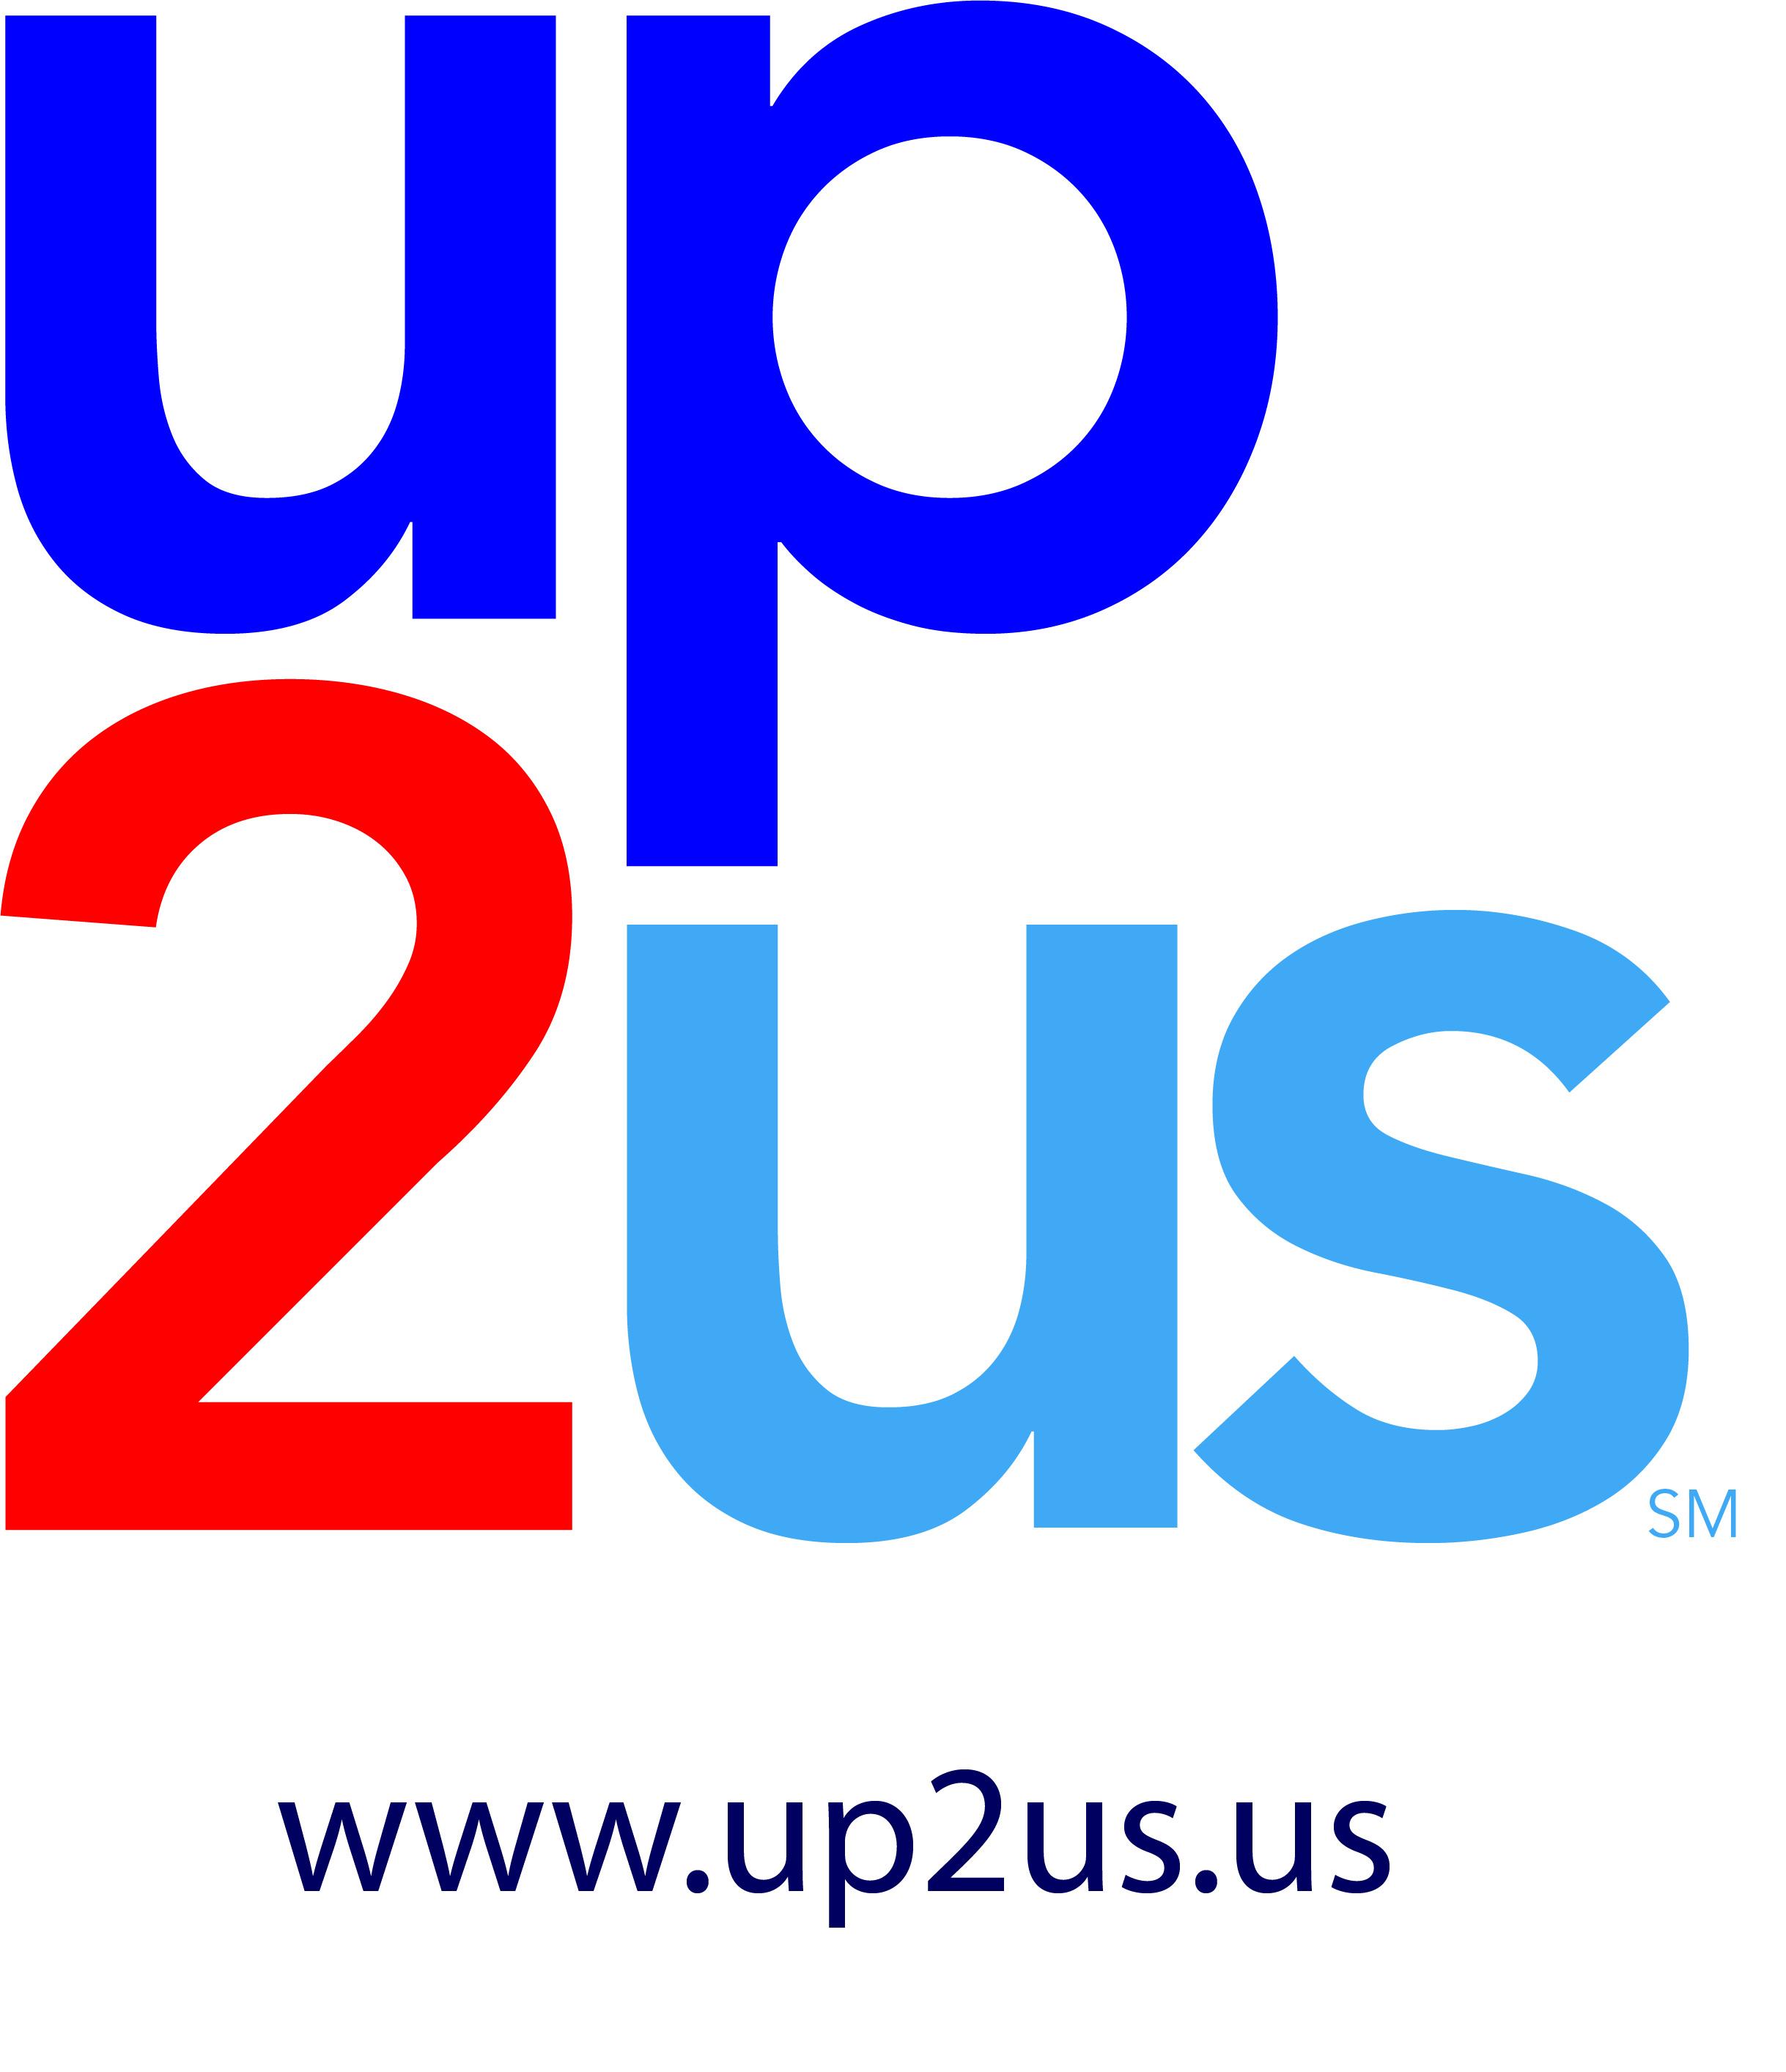 up2us avenir_url2.jpg